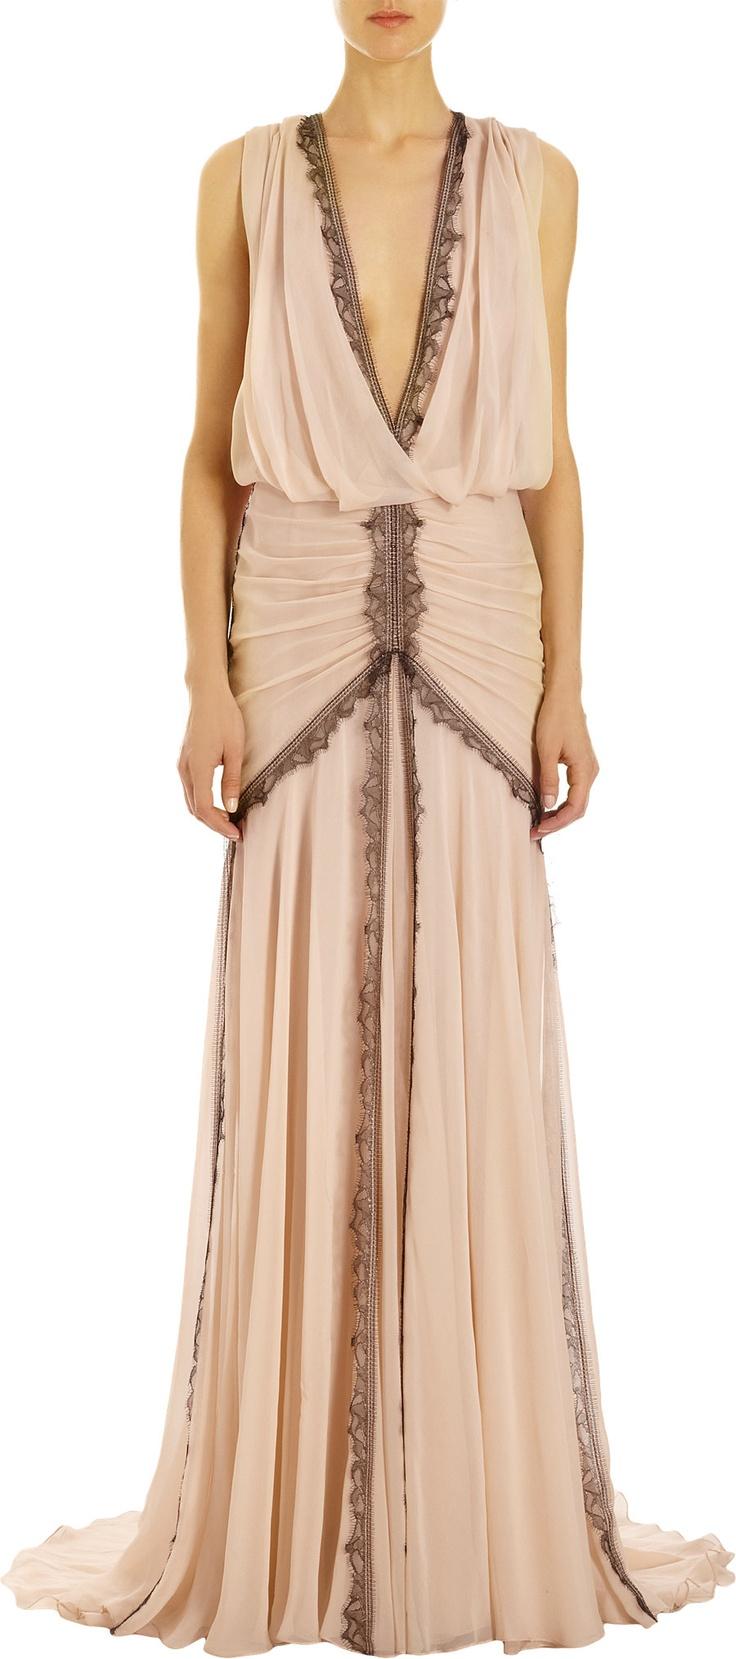 Barney's Evening Dresses